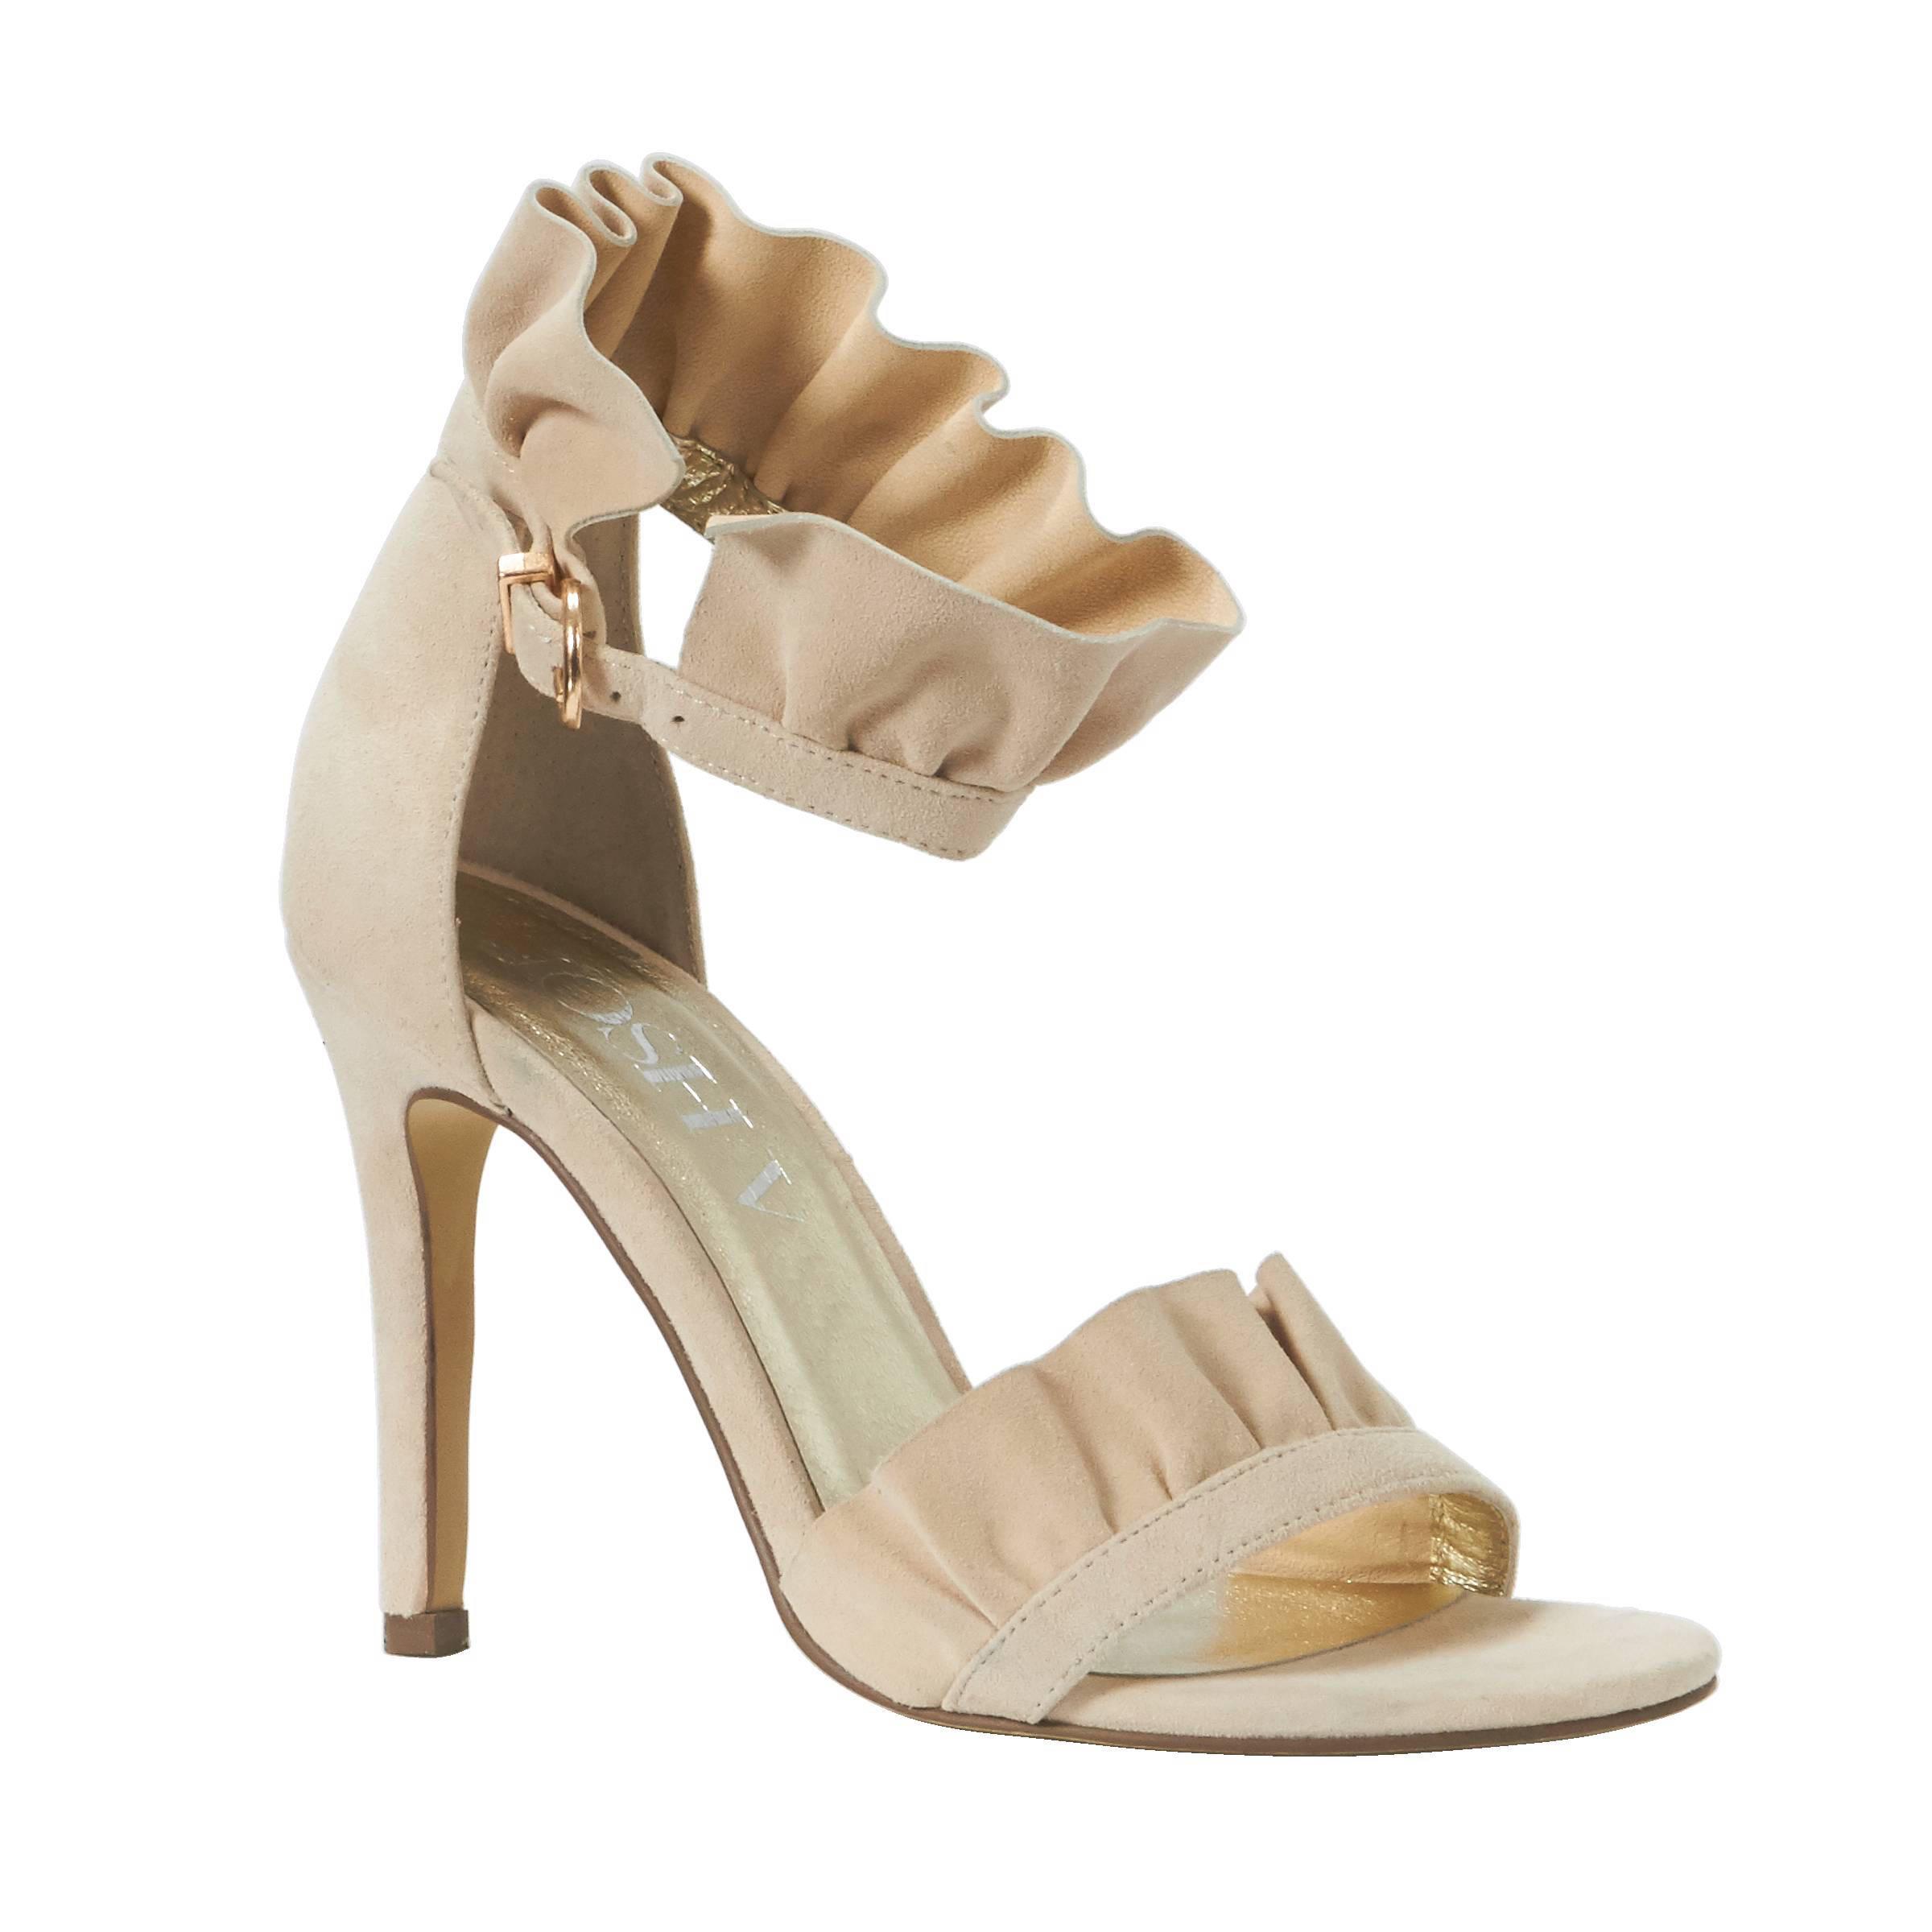 410442ec01d91b Noella suède sandalettes - Frontrunner.nl